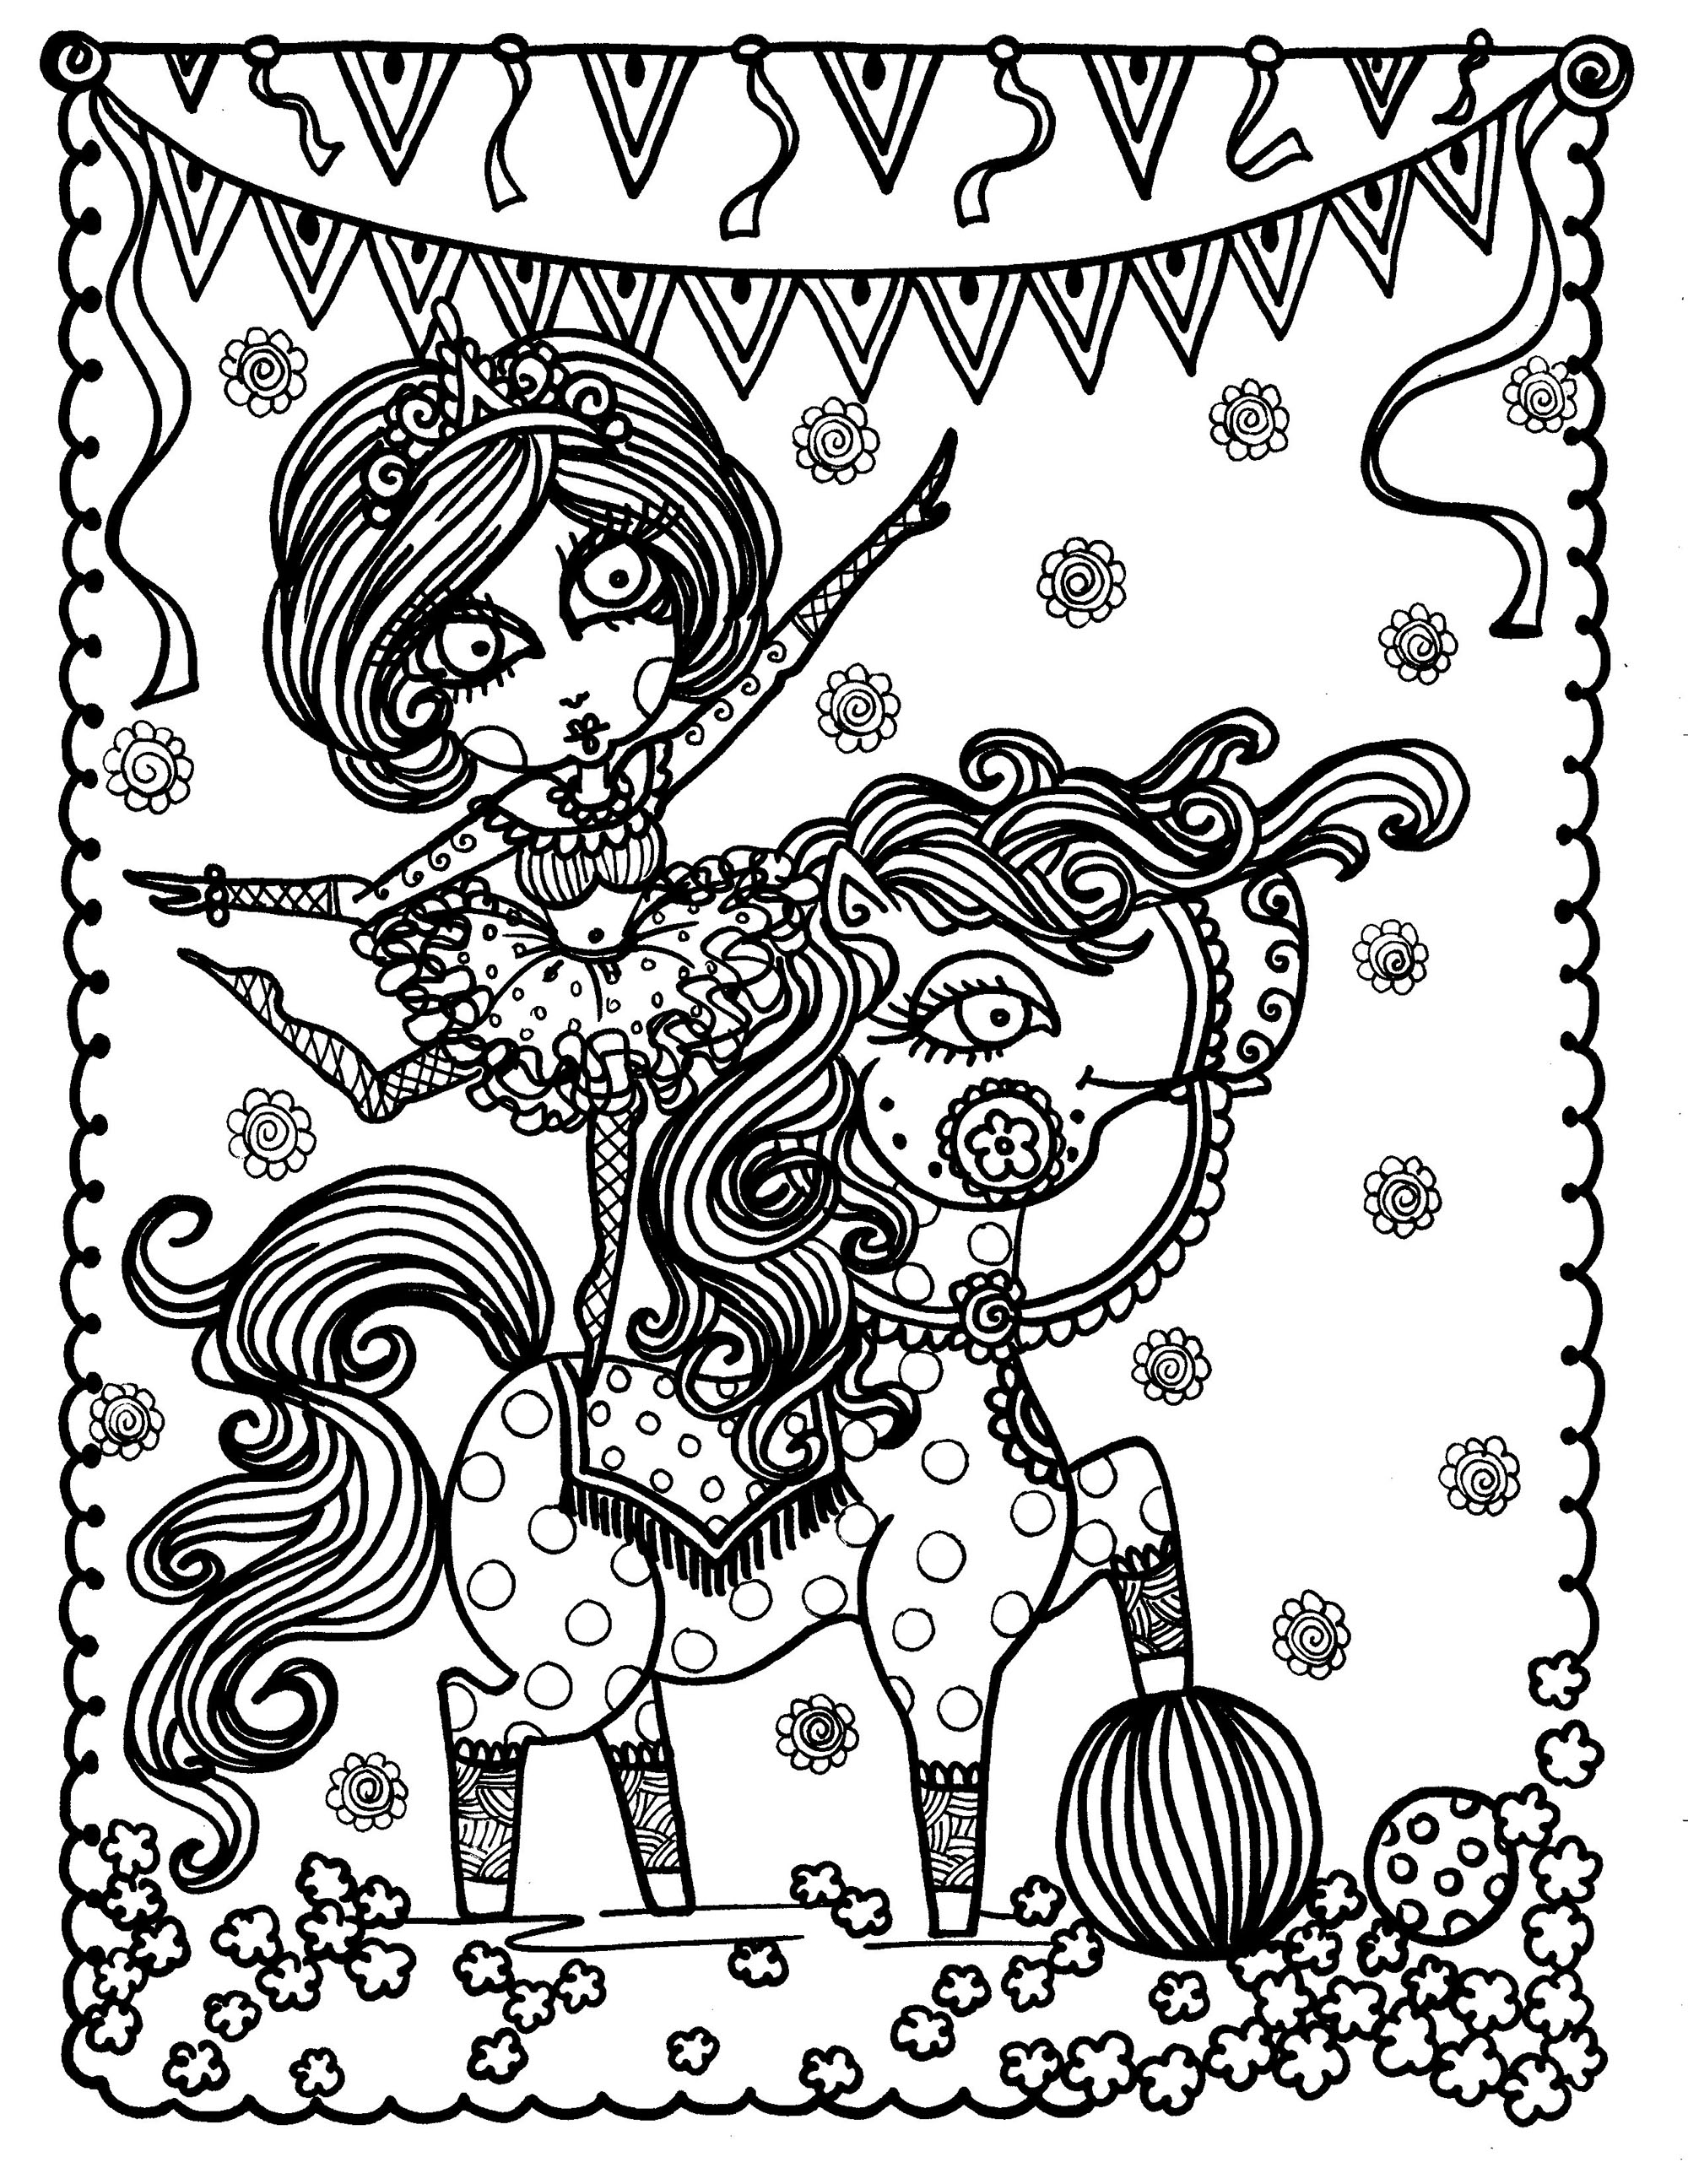 Acrobat girl on horseFrom the gallery : Zen & Anti StressArtist : Deborah Muller